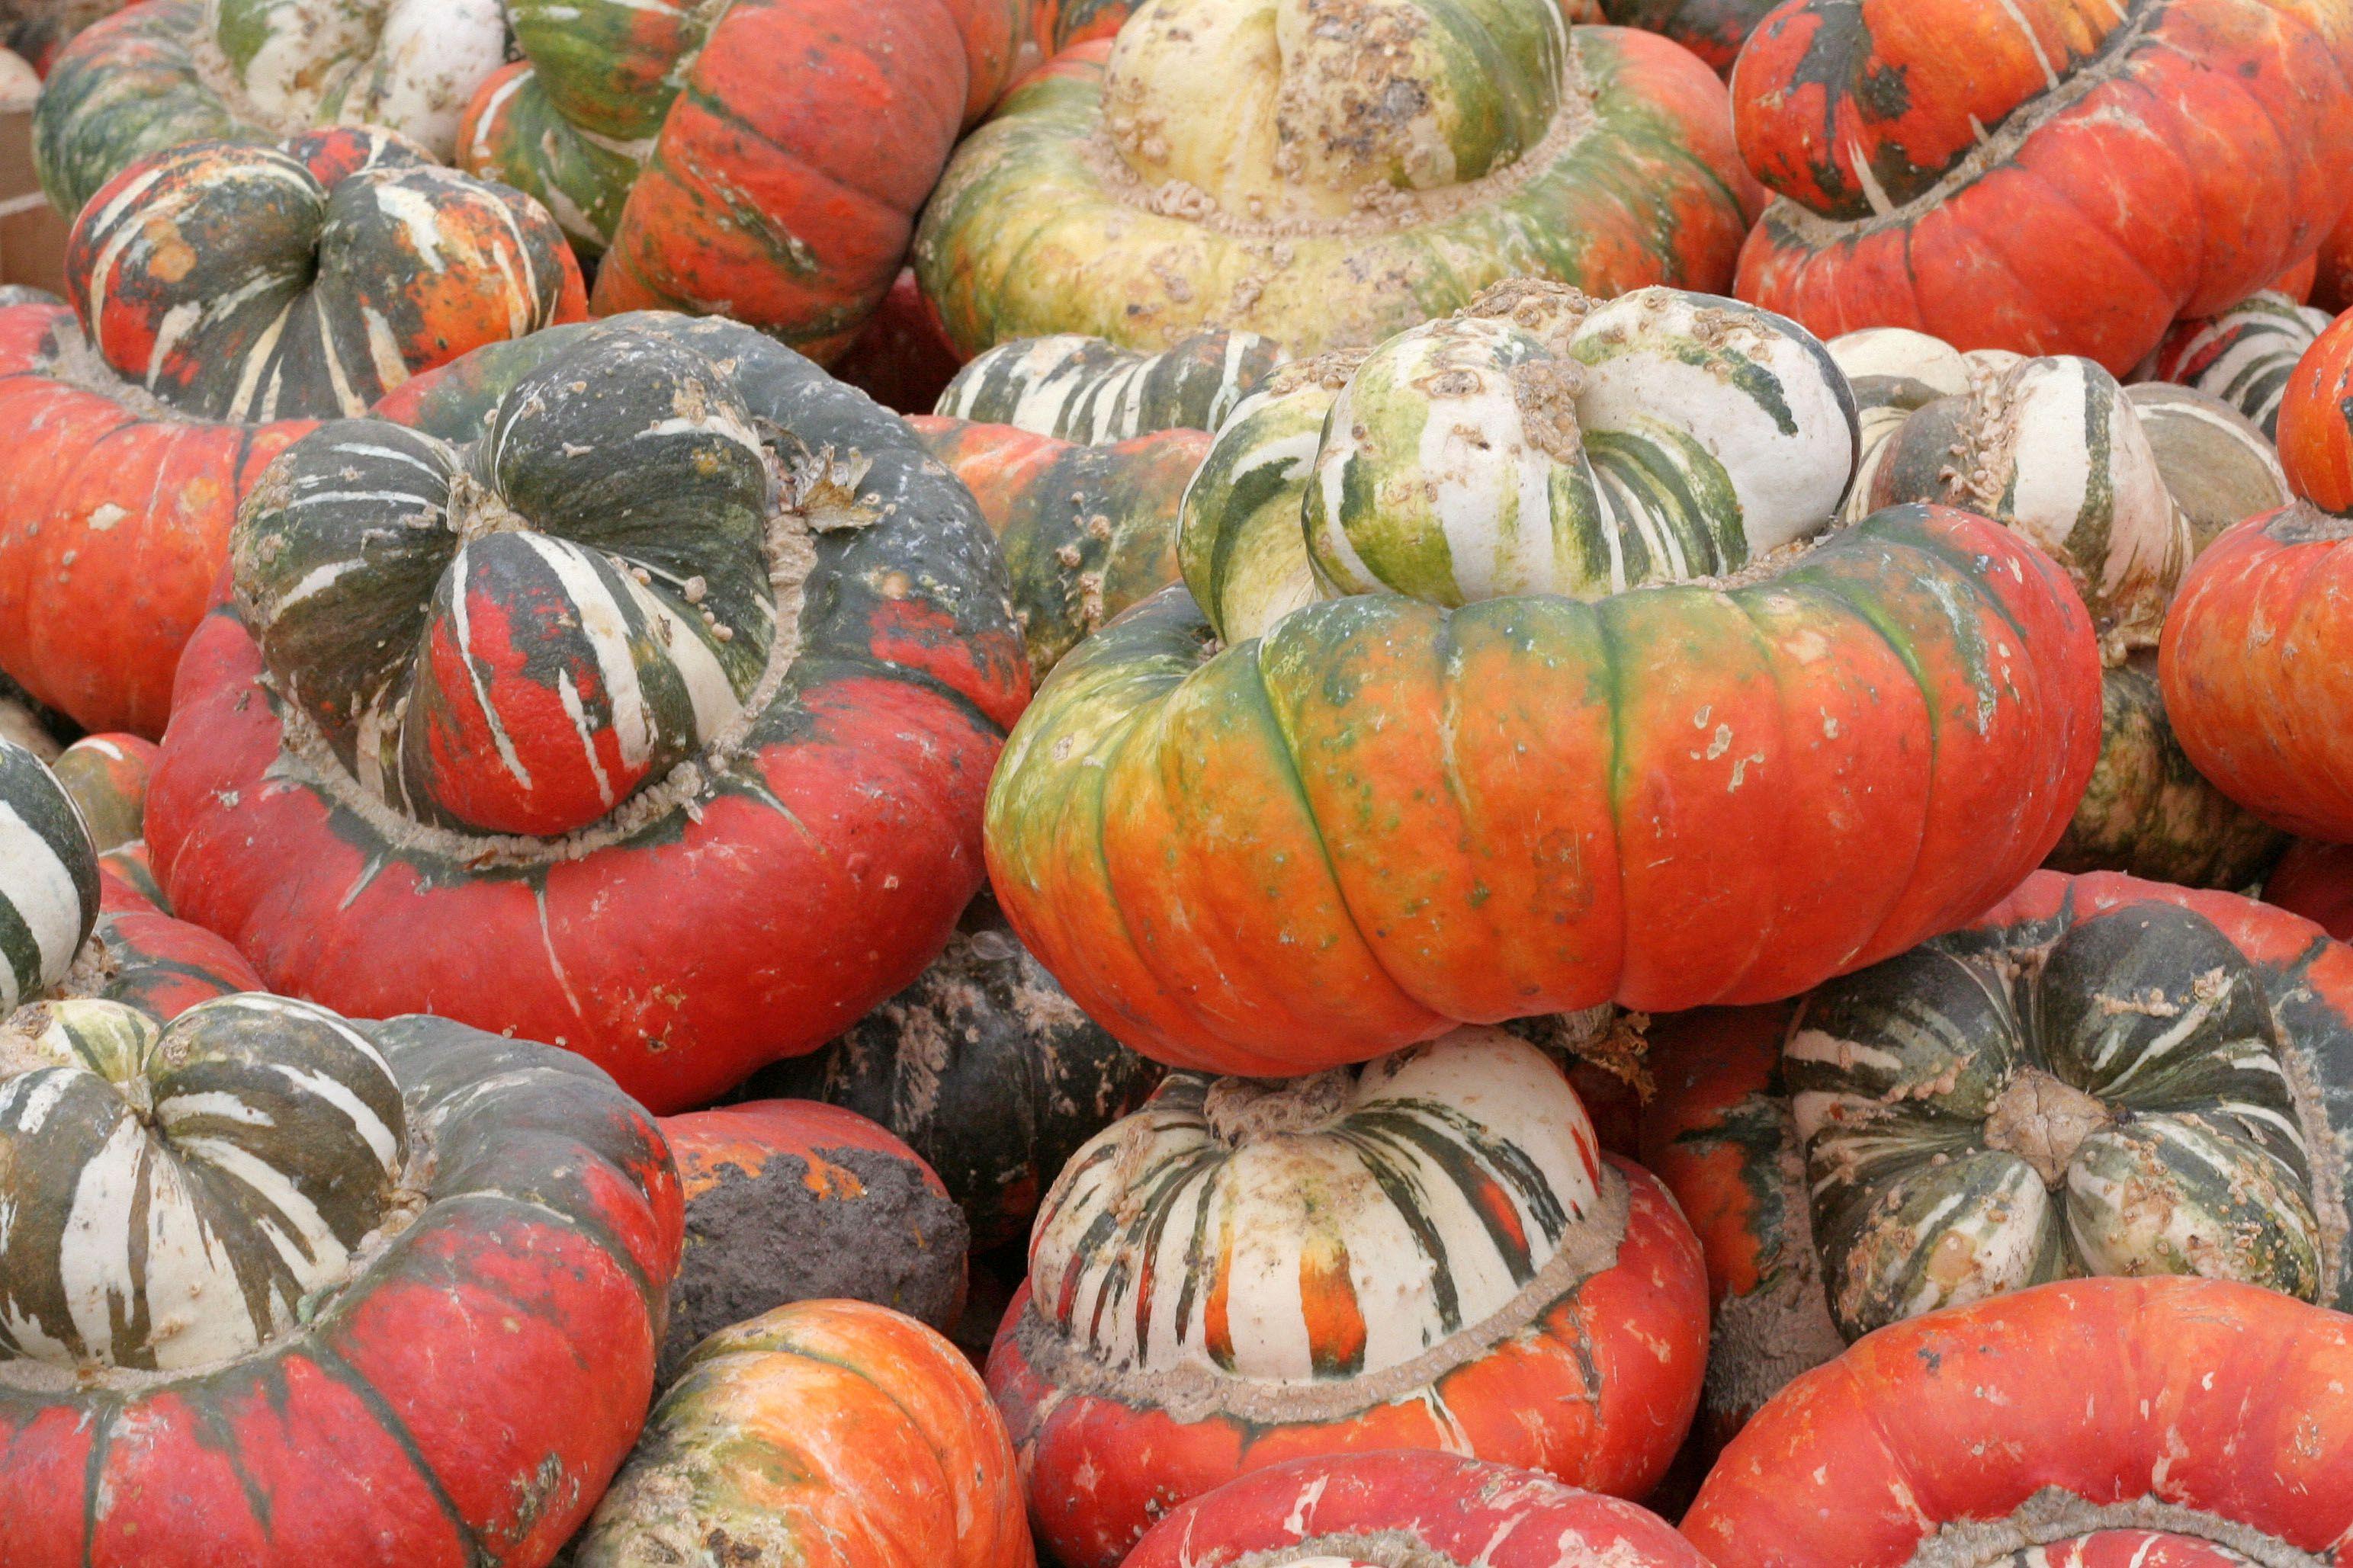 Pile of Turban Squash at Farmers Market